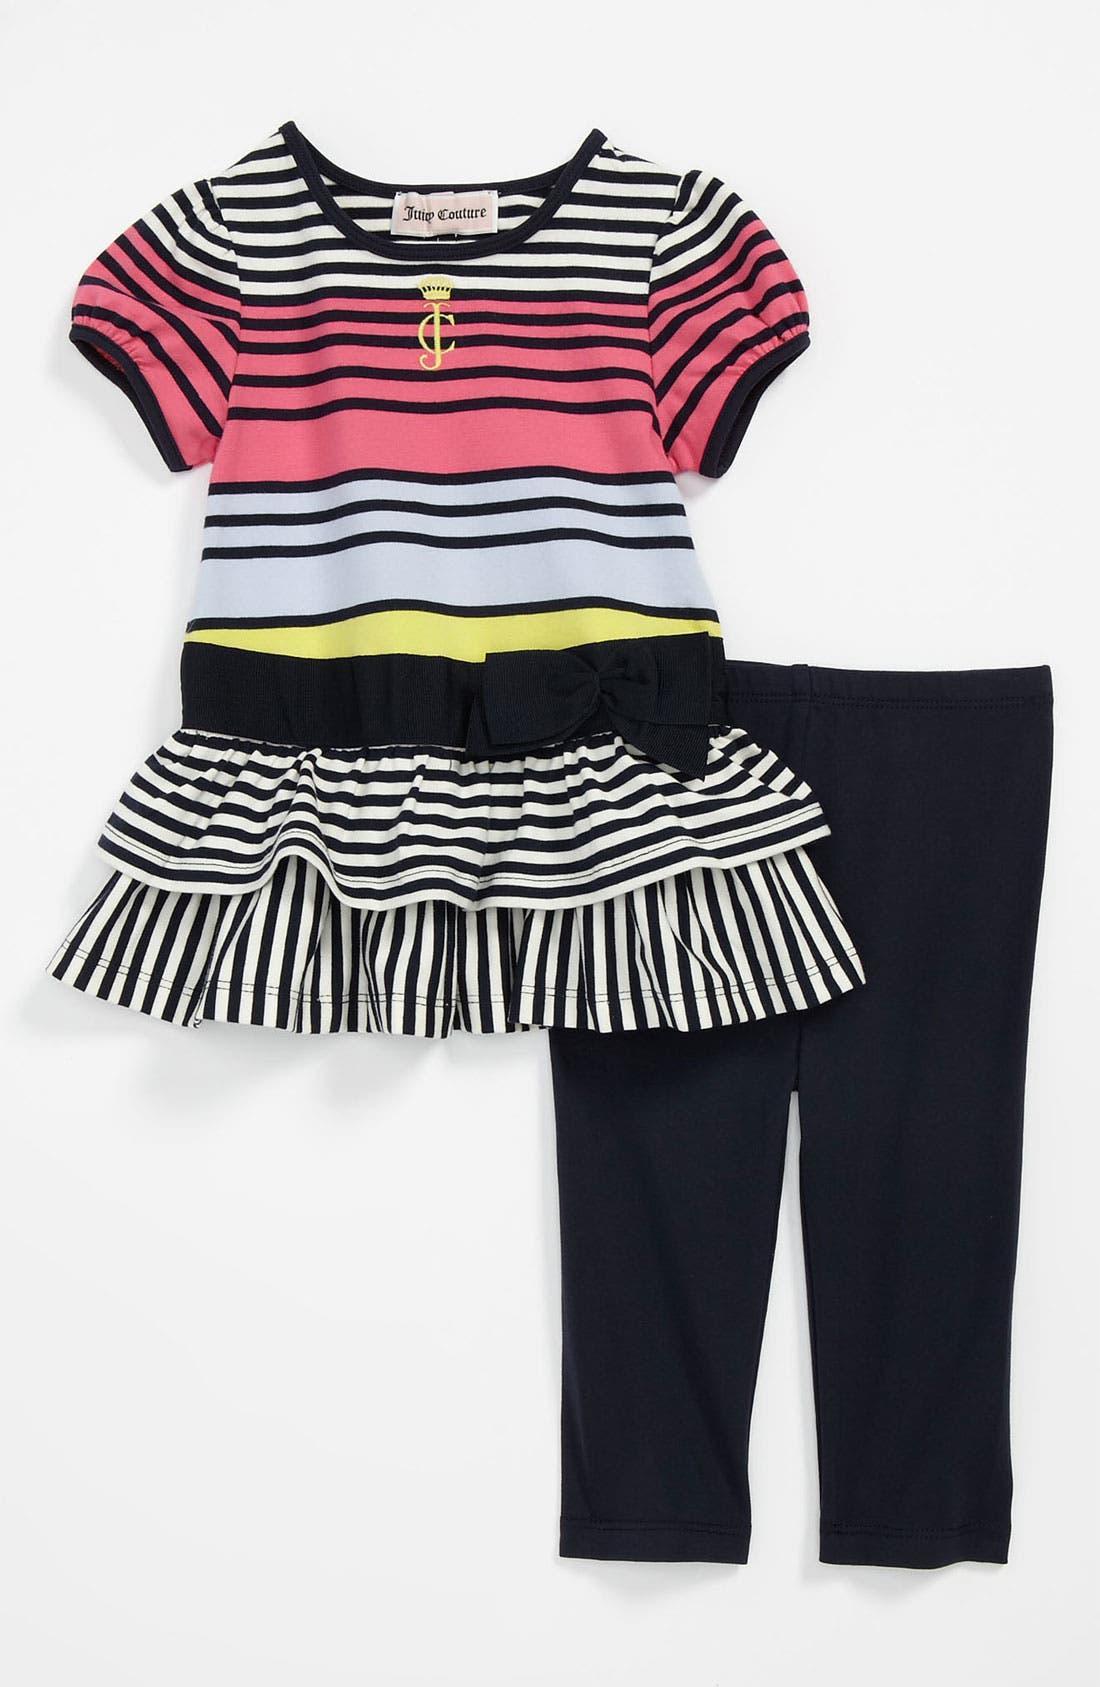 Main Image - Juicy Couture Stripe Tunic & Leggings (Infant)